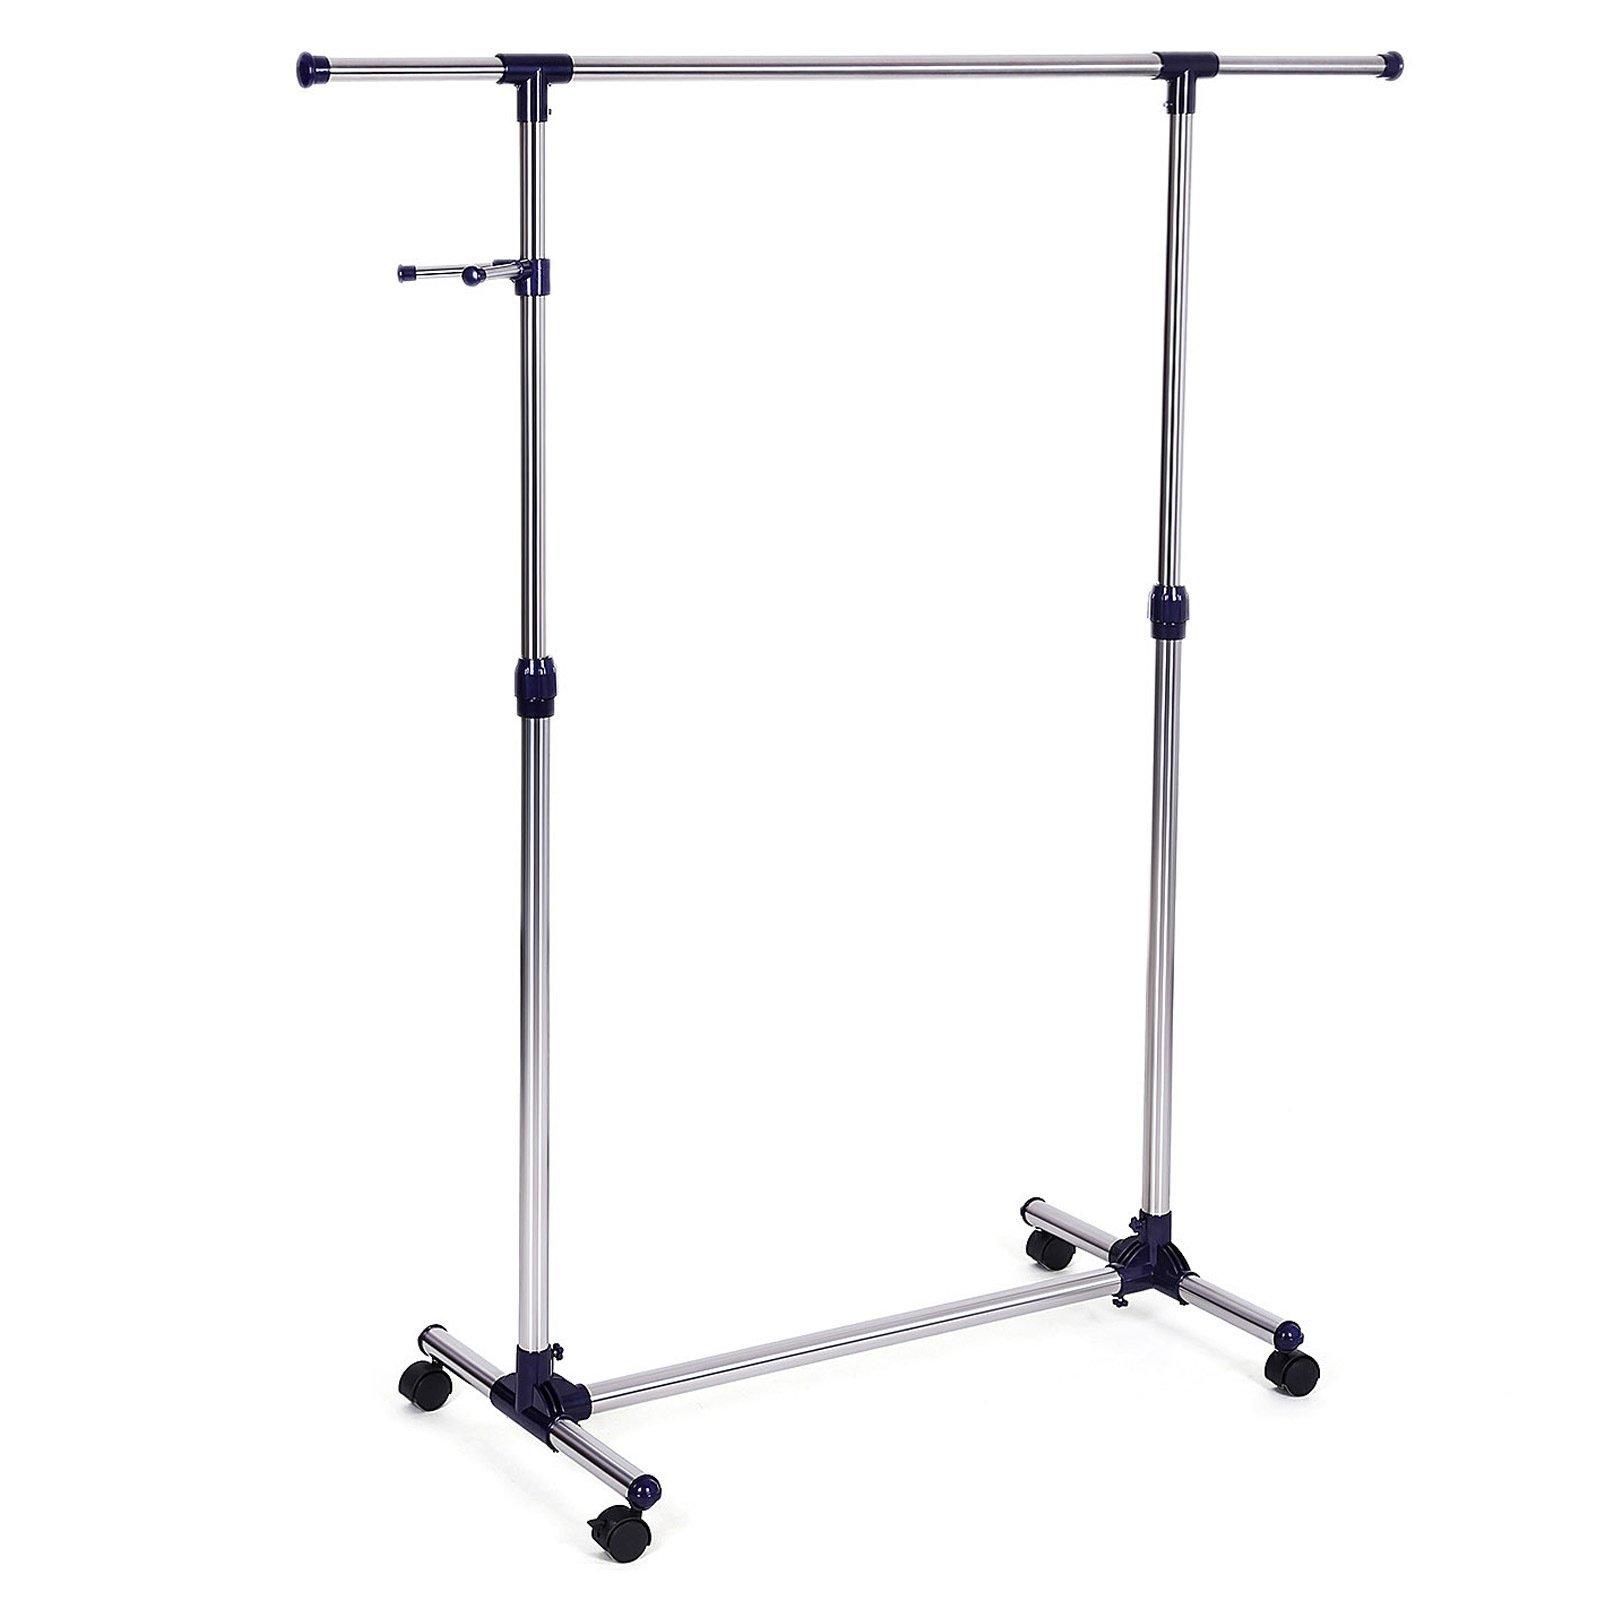 Songmics height adjustable clothes rack rolling garment rack portable clothing rack on wheels ullr01l